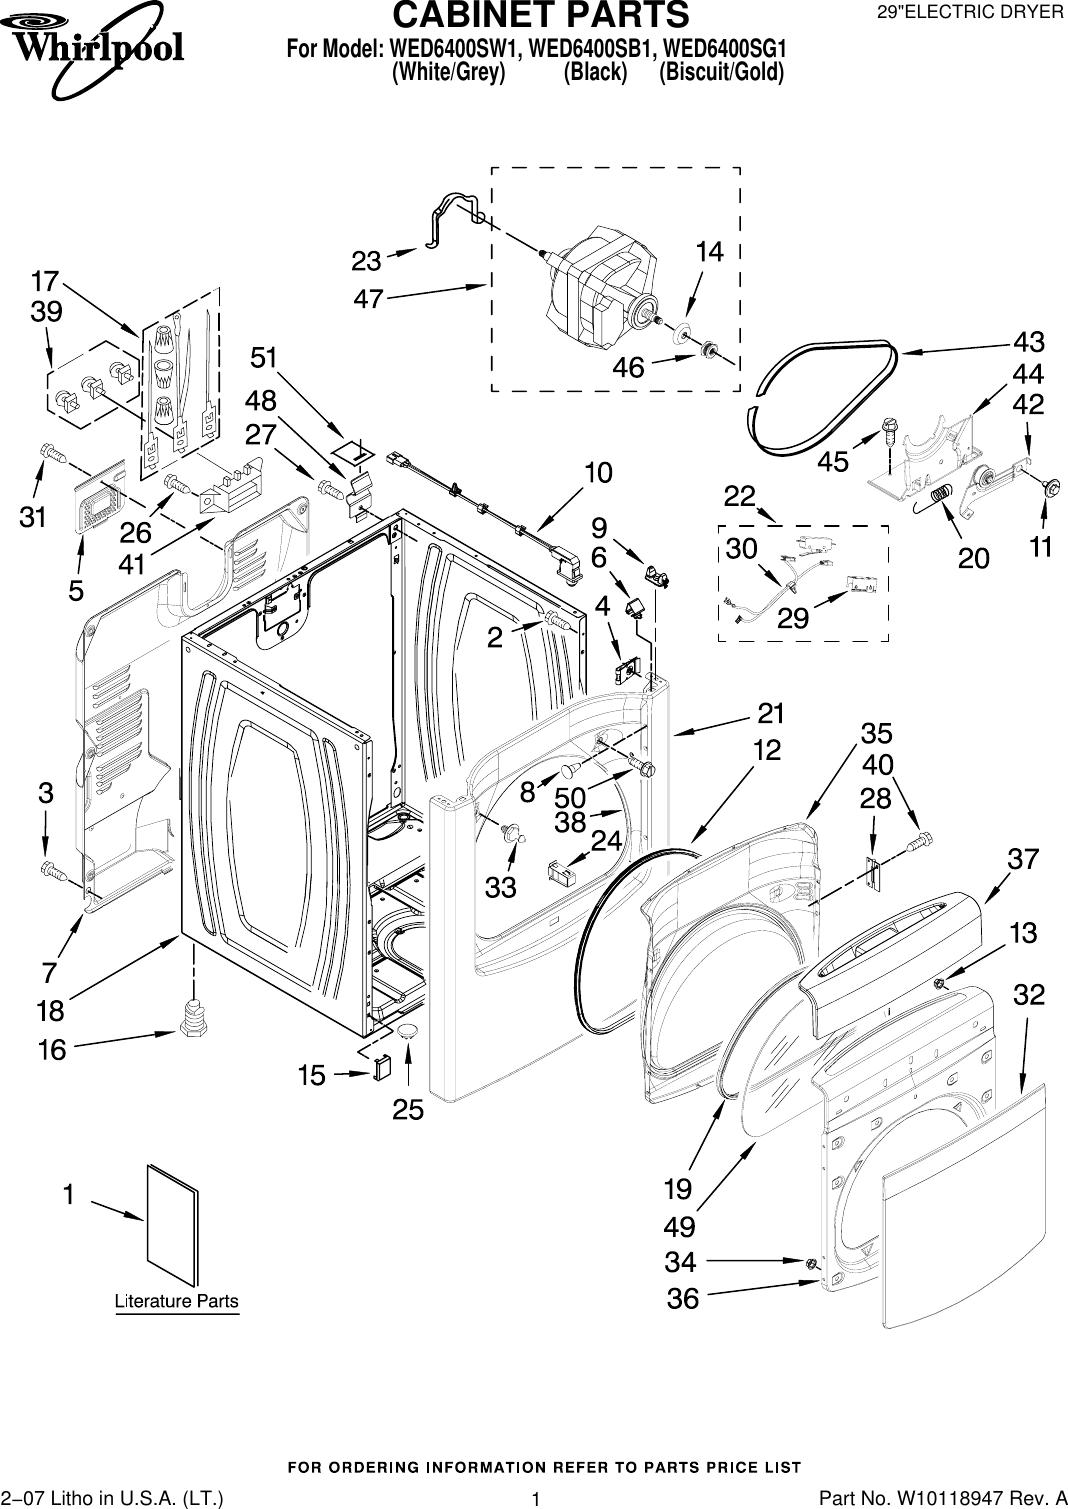 Wed Sw1 Wiring Diagram